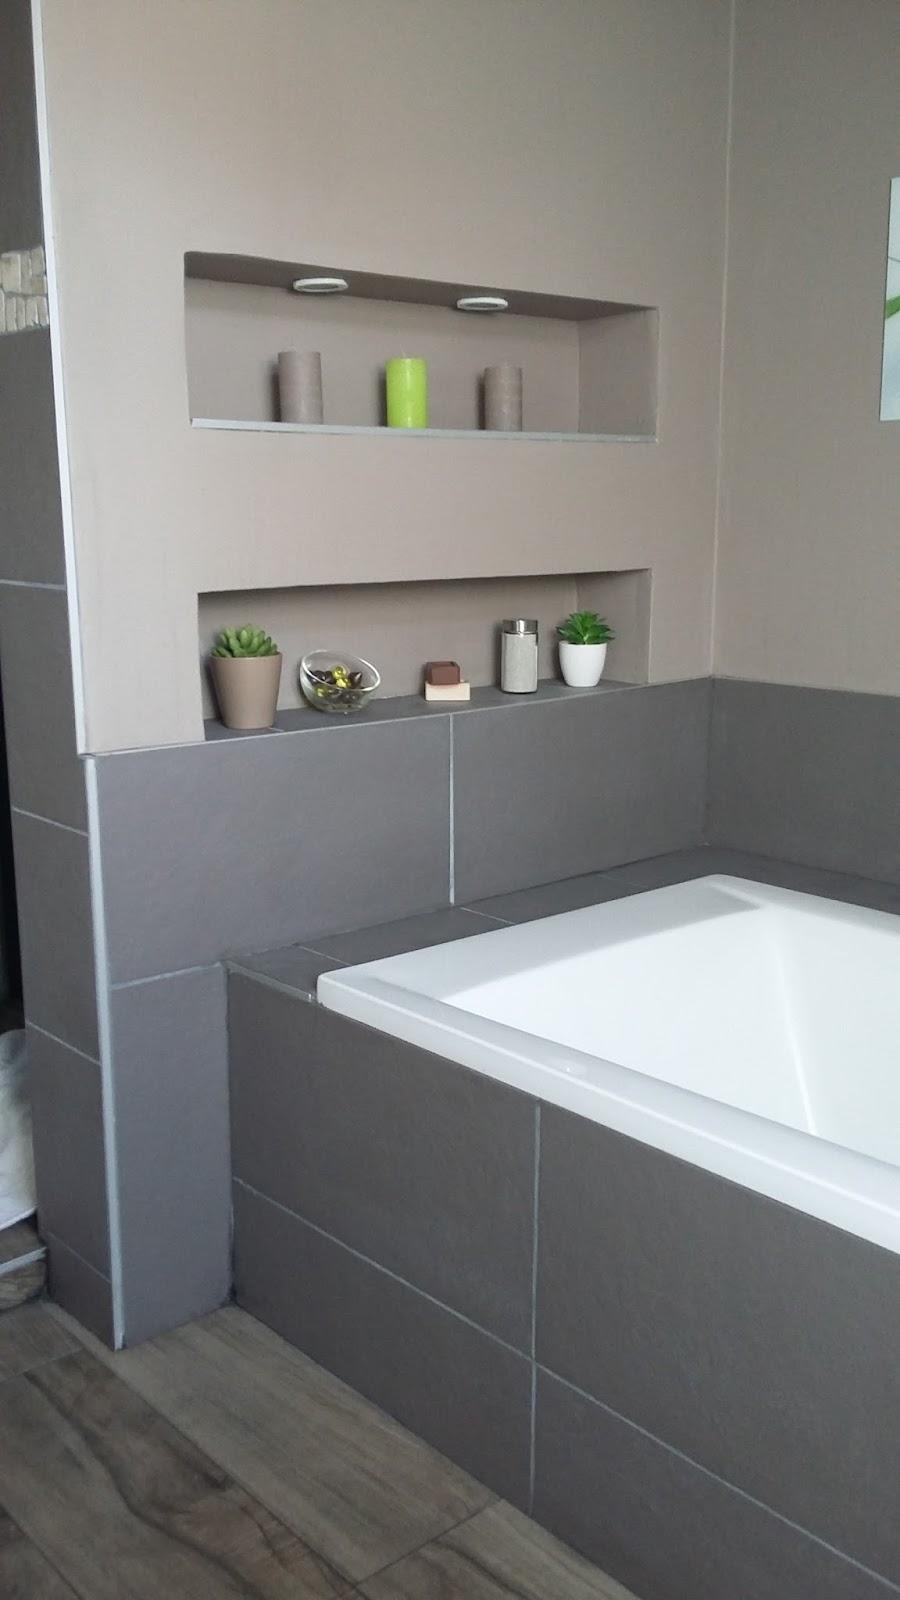 salle de bain baignoire rose bricolage de lide la ralisation salle de bain zen et - Salle De Bain Baignoire Rose